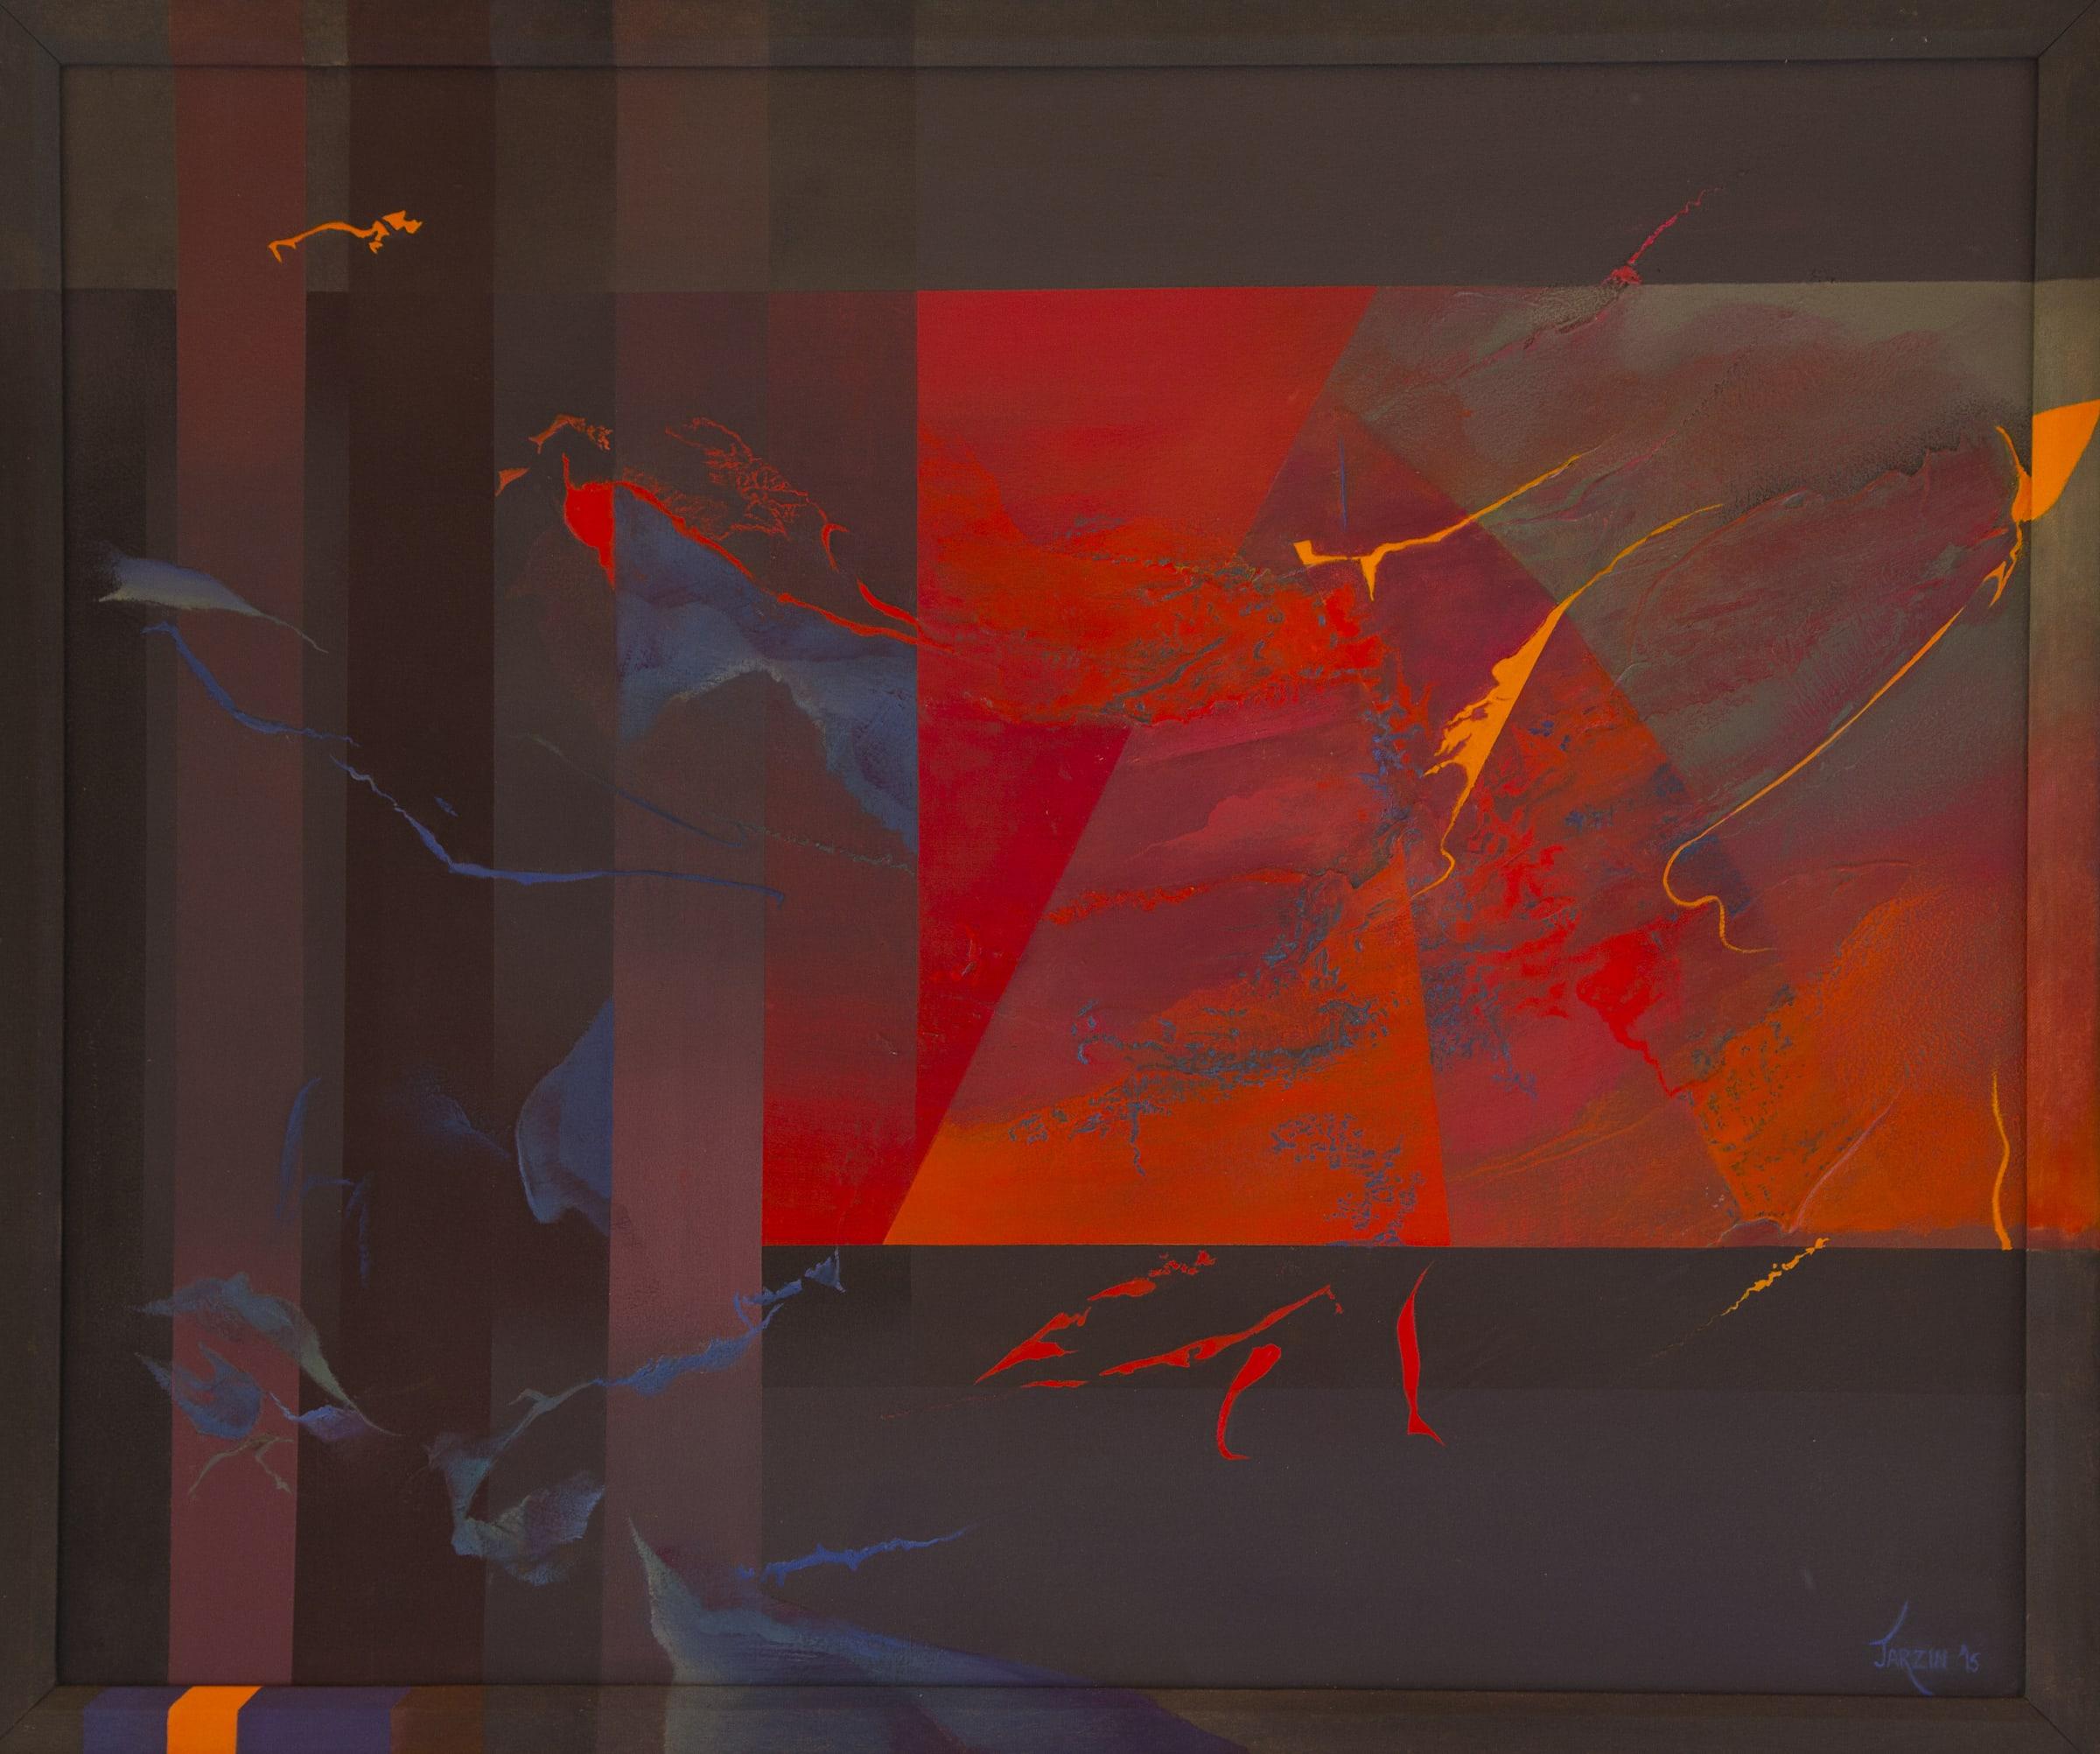 <span class=&#34;link fancybox-details-link&#34;><a href=&#34;/artists/44-sheila-jarzin/works/1009-sheila-jarzin-fragmentation-2015/&#34;>View Detail Page</a></span><div class=&#34;artist&#34;><strong>Sheila Jarzin</strong></div> <div class=&#34;title&#34;><em>Fragmentation</em>, 2015</div> <div class=&#34;medium&#34;>Oil on Canvas</div> <div class=&#34;dimensions&#34;>81cm x 96cm</div><div class=&#34;price&#34;>R11,200.00</div>